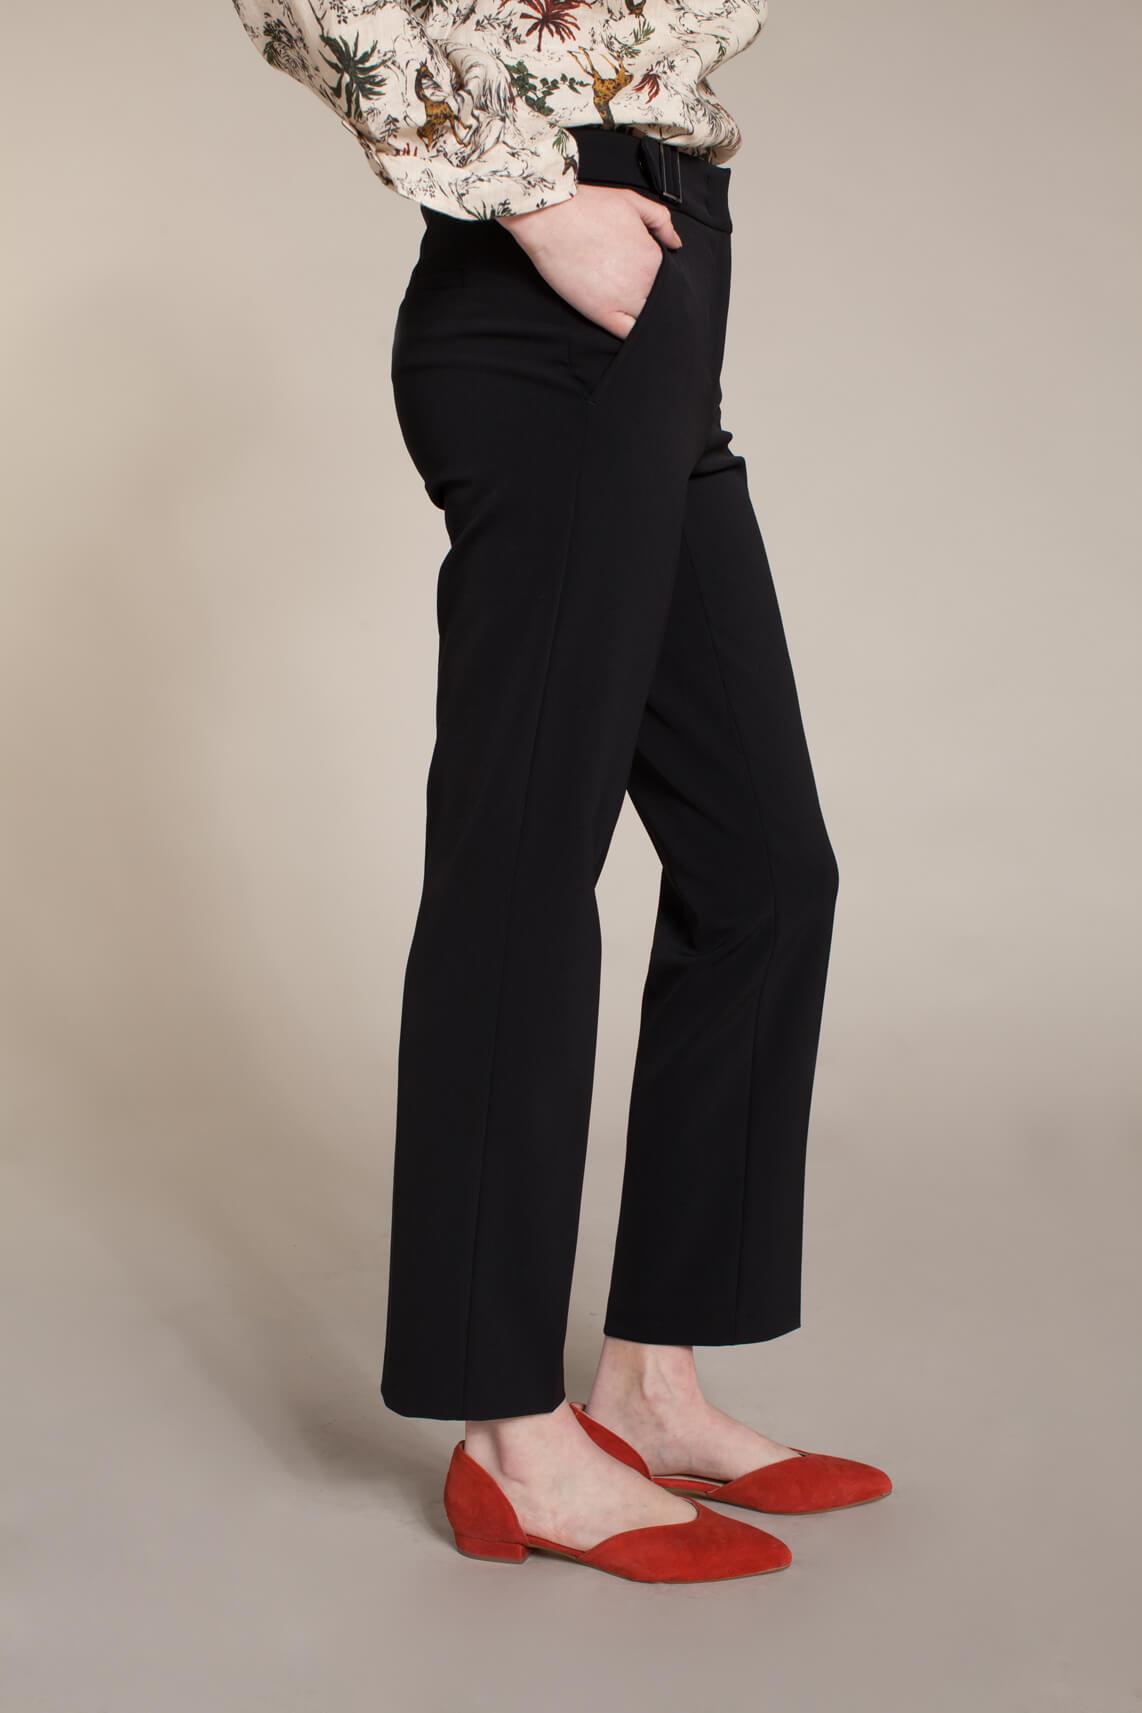 Cambio Dames Gin pantalon met gespen Zwart